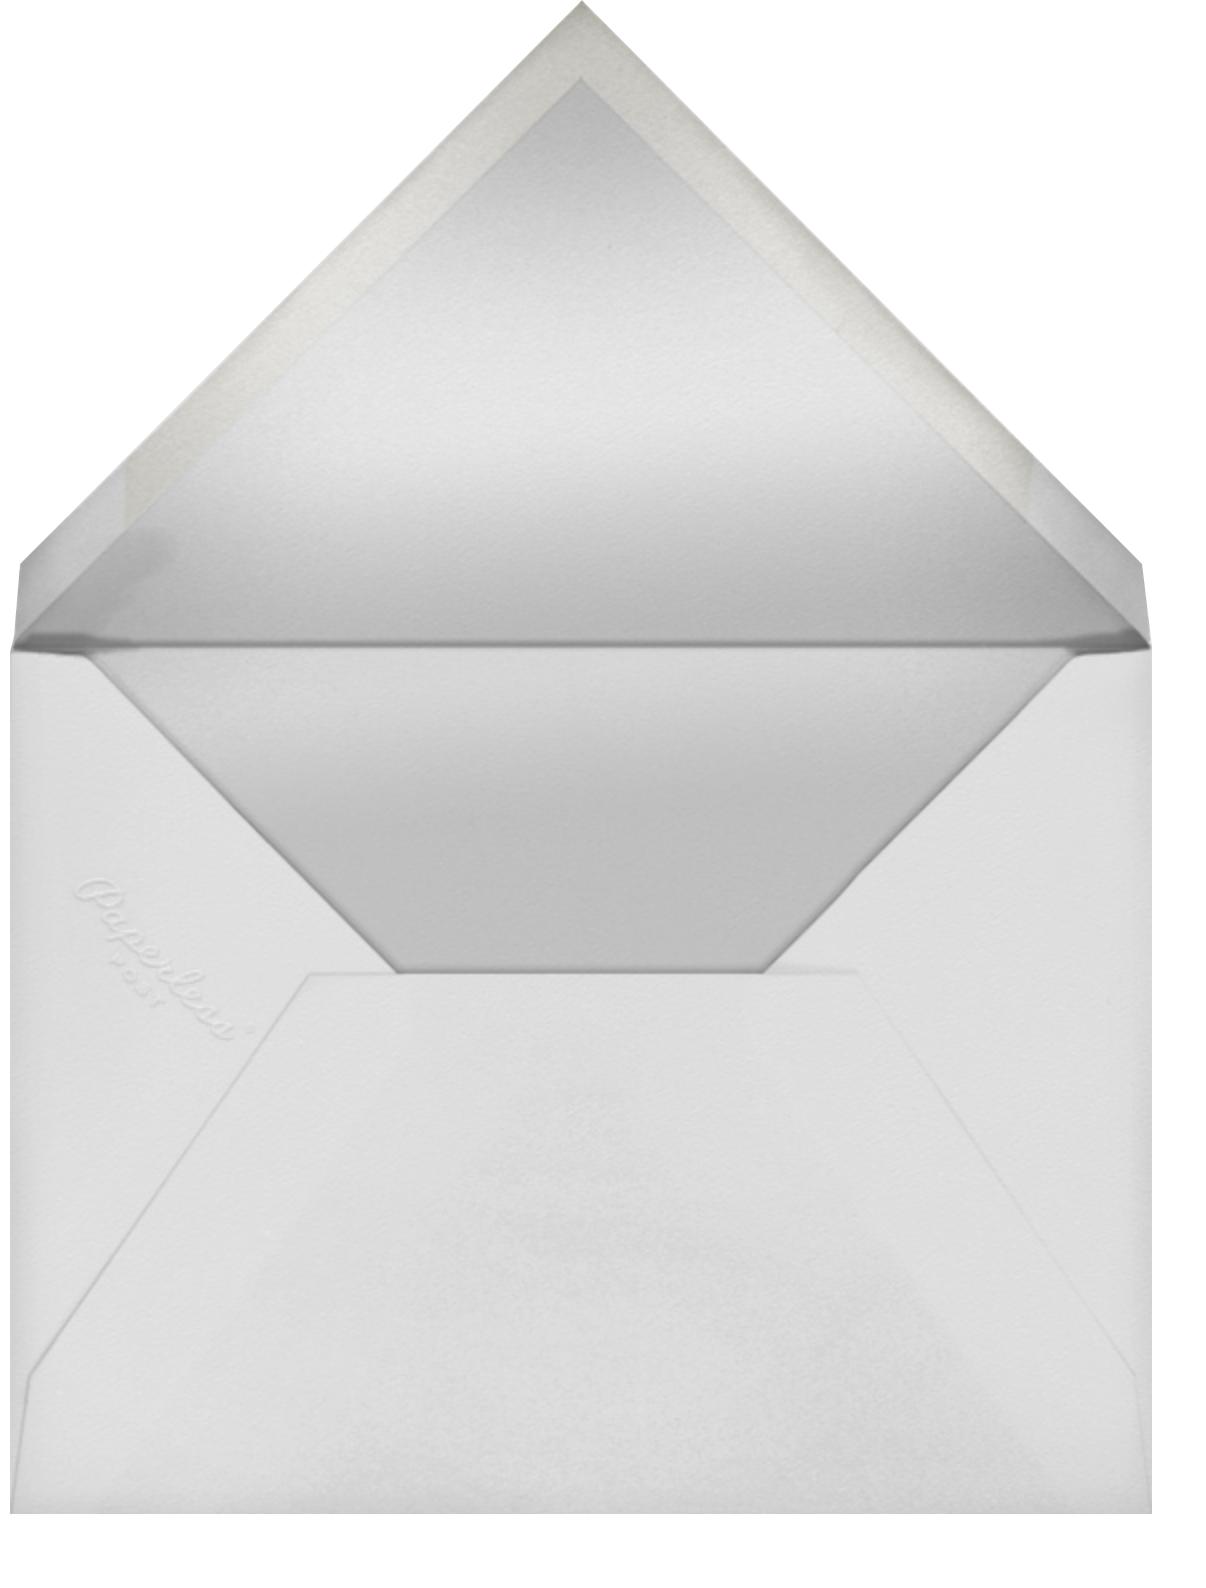 Betsy (Menu) - Capri - Liberty - Envelope